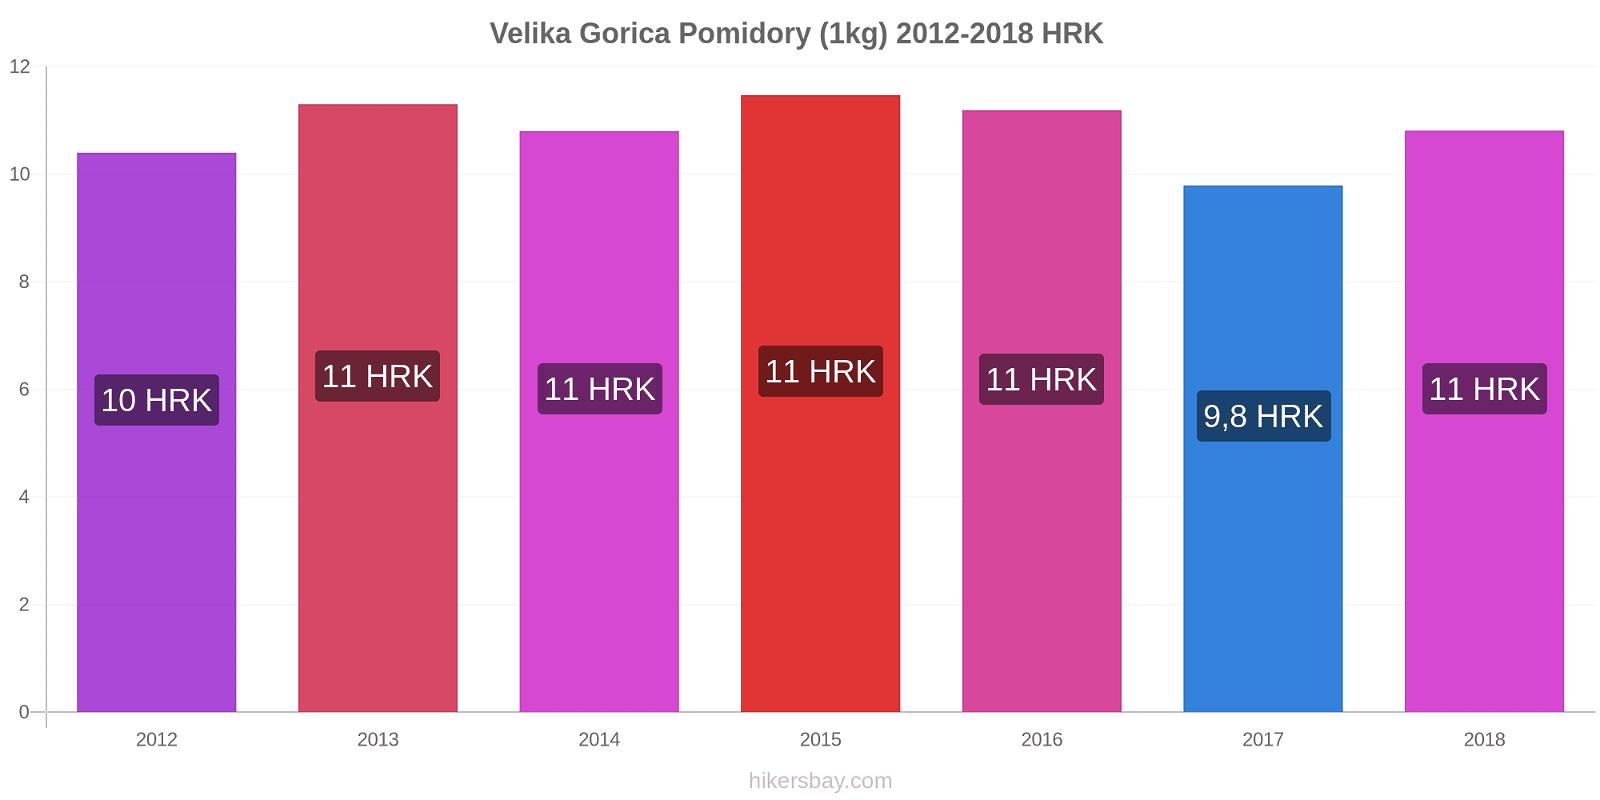 Velika Gorica zmiany cen Pomidory (1kg) hikersbay.com